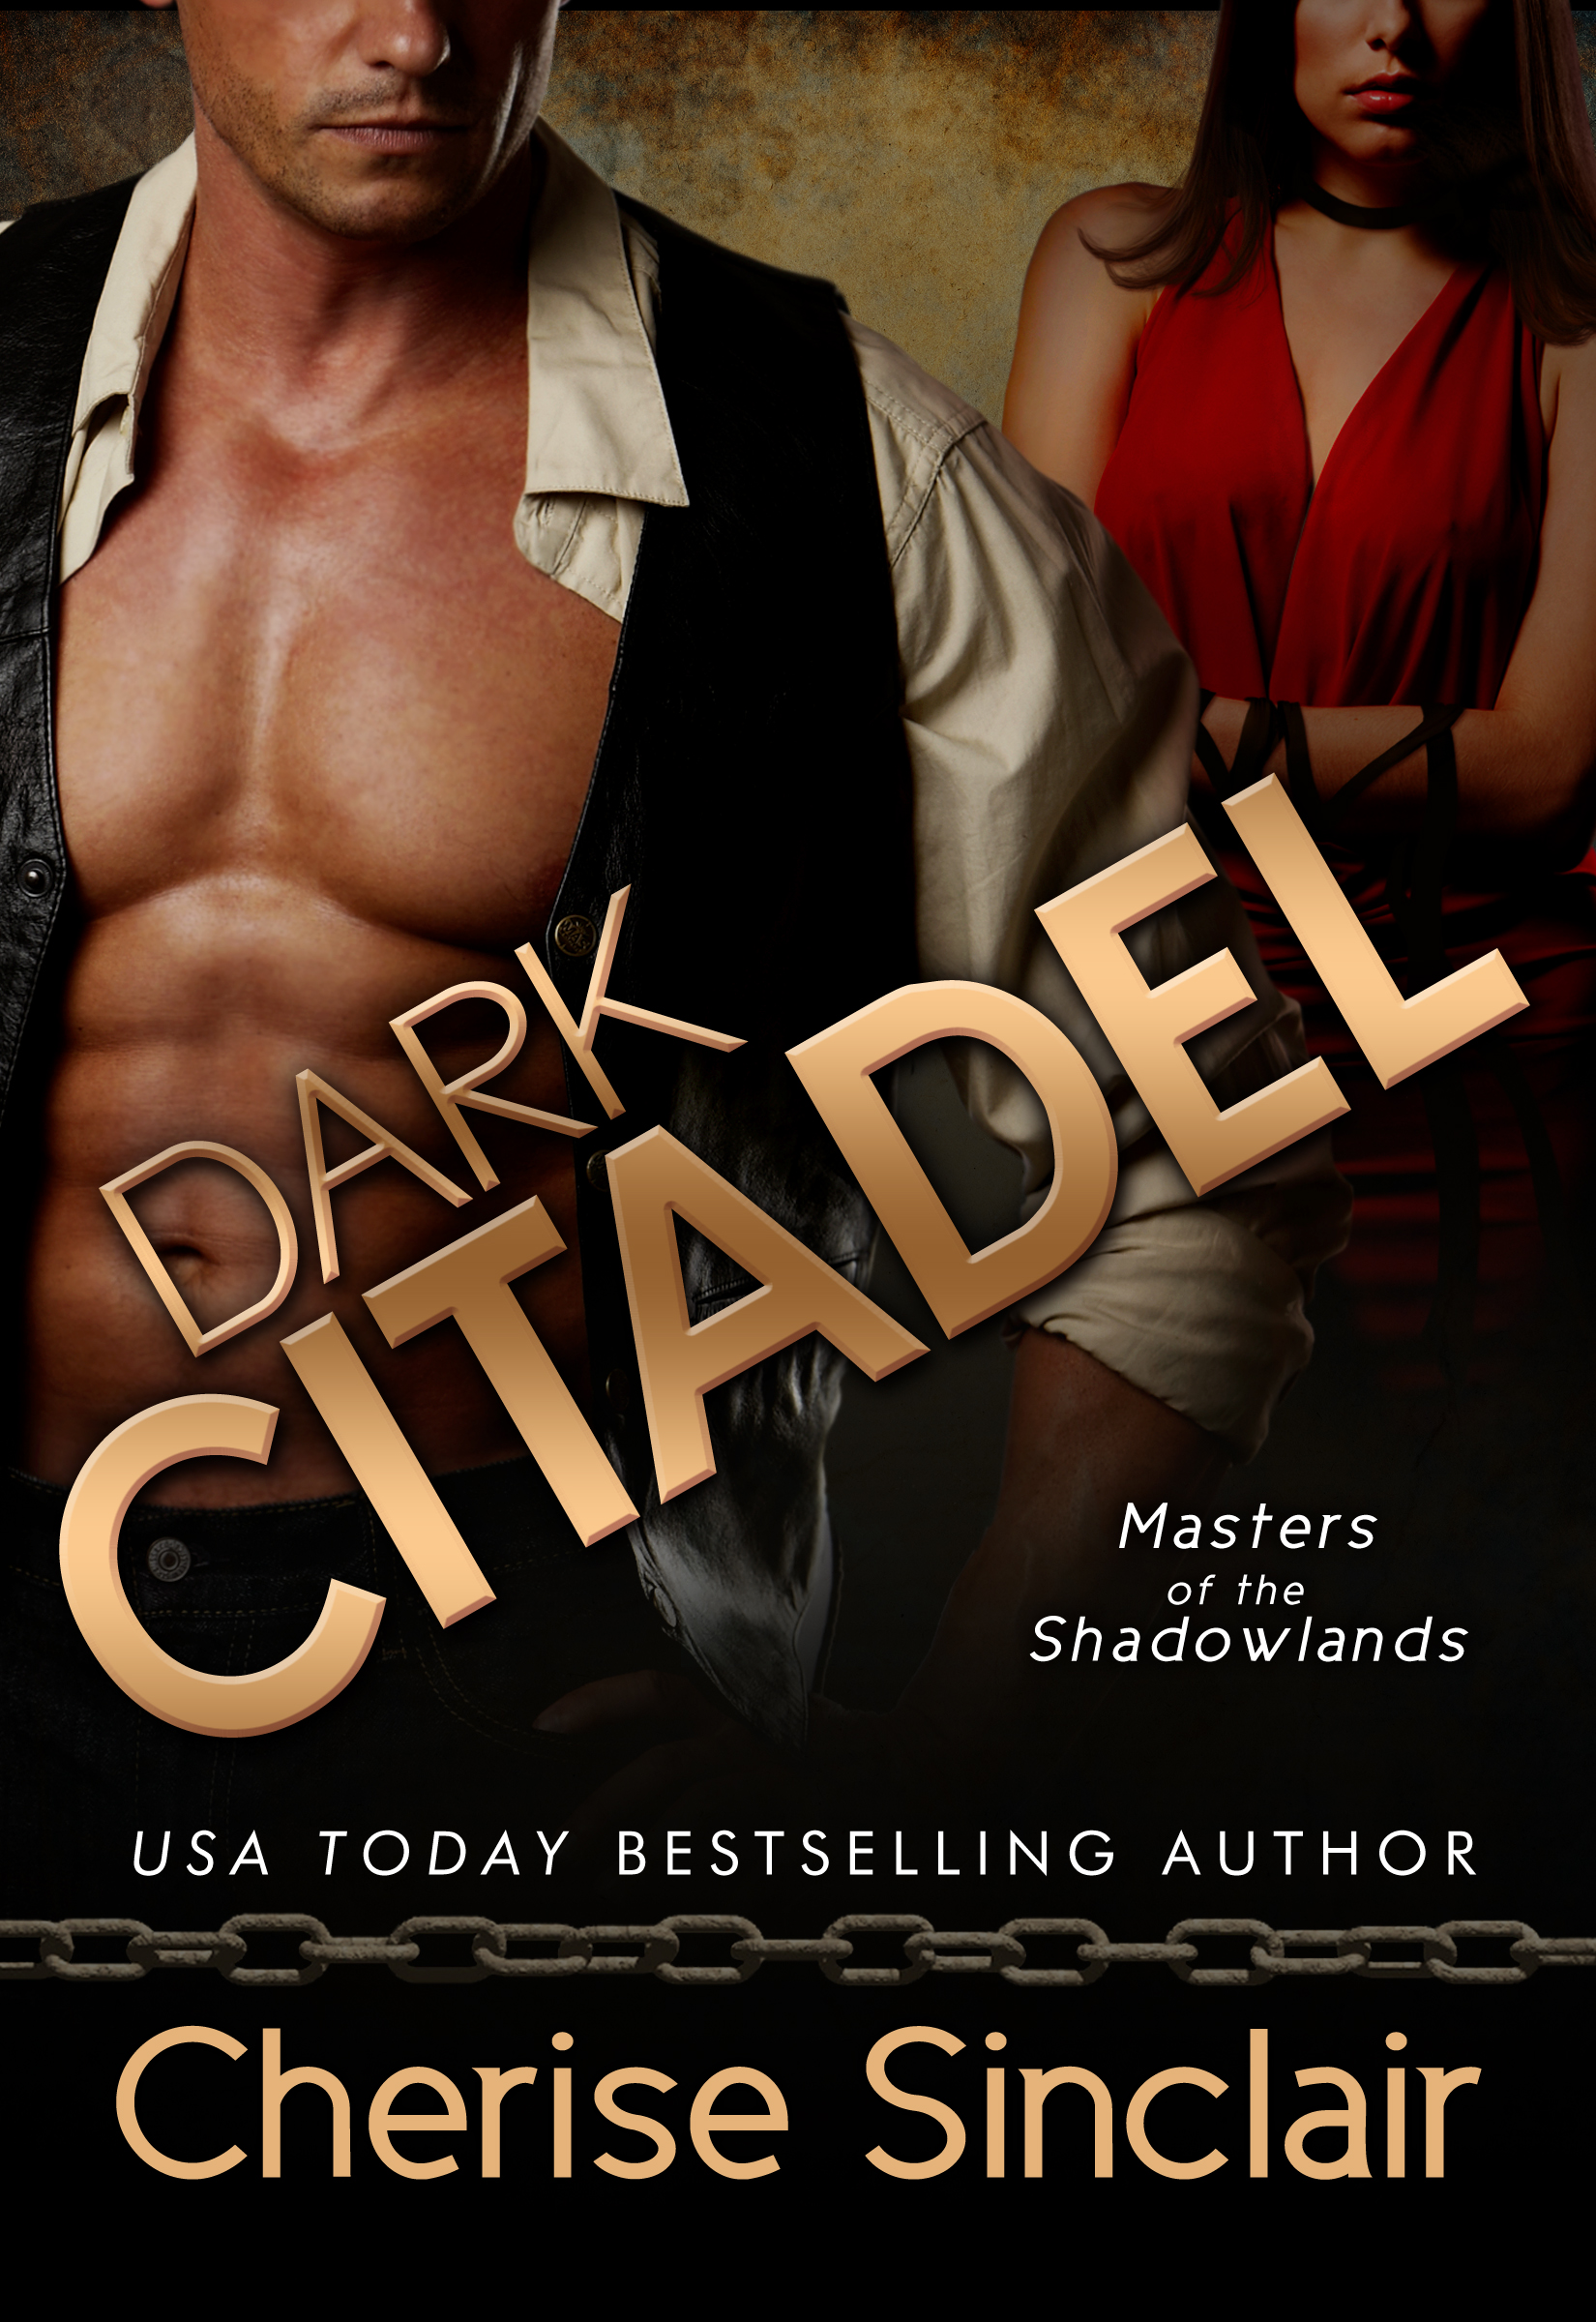 Cherise Sinclair - Dark Citadel: Masters of the Shadowlands 2